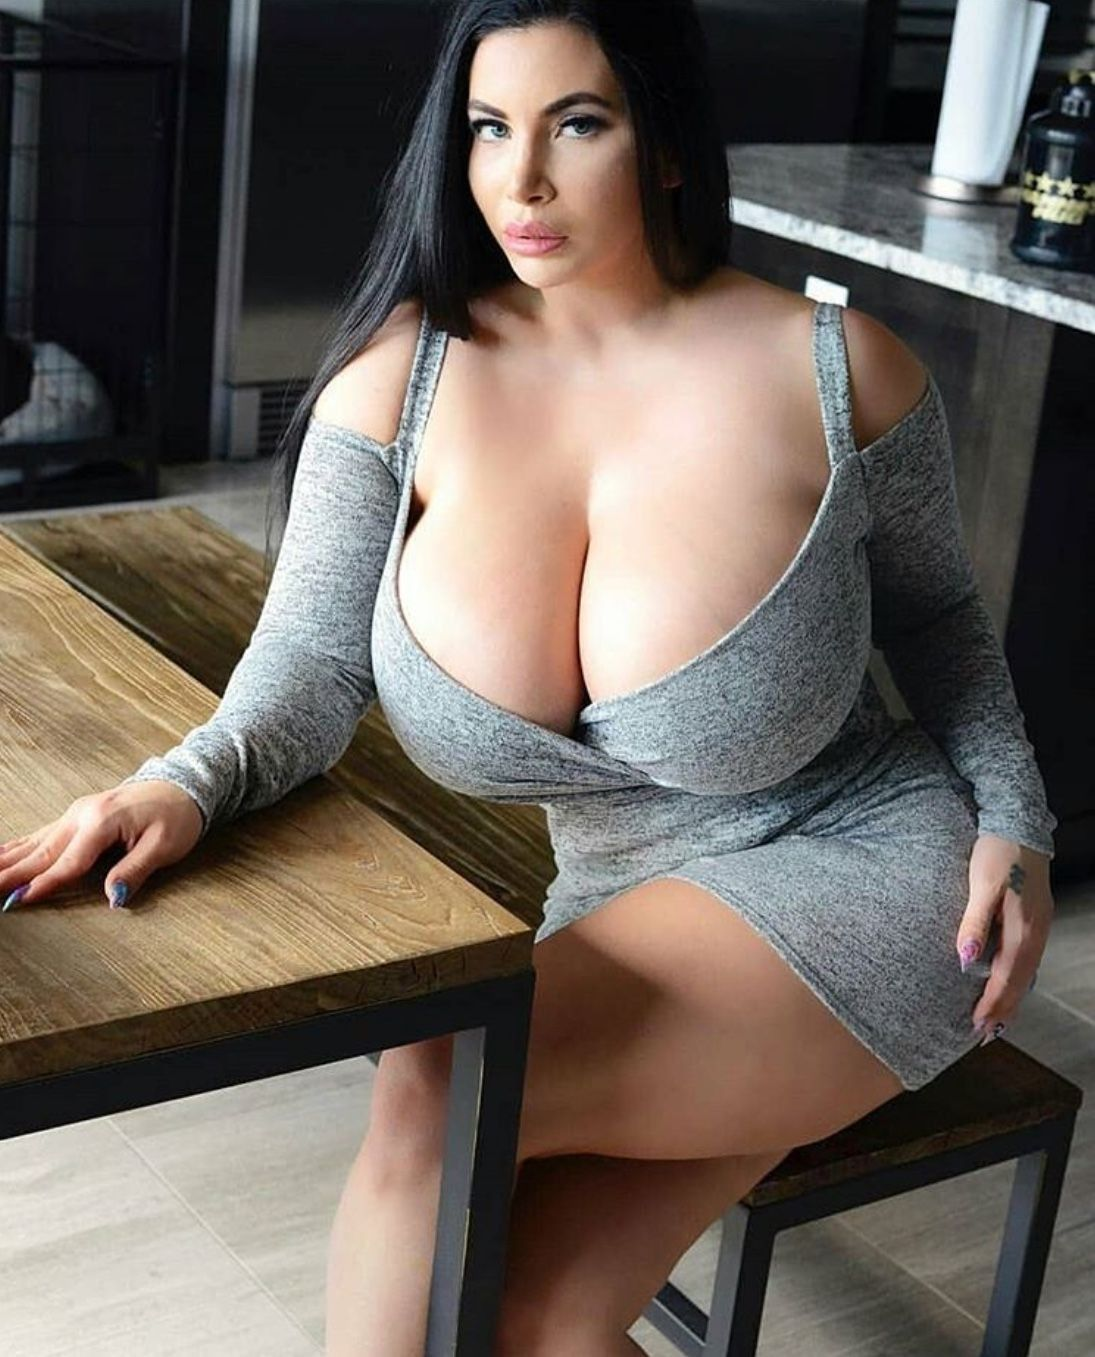 Big sexy jugs